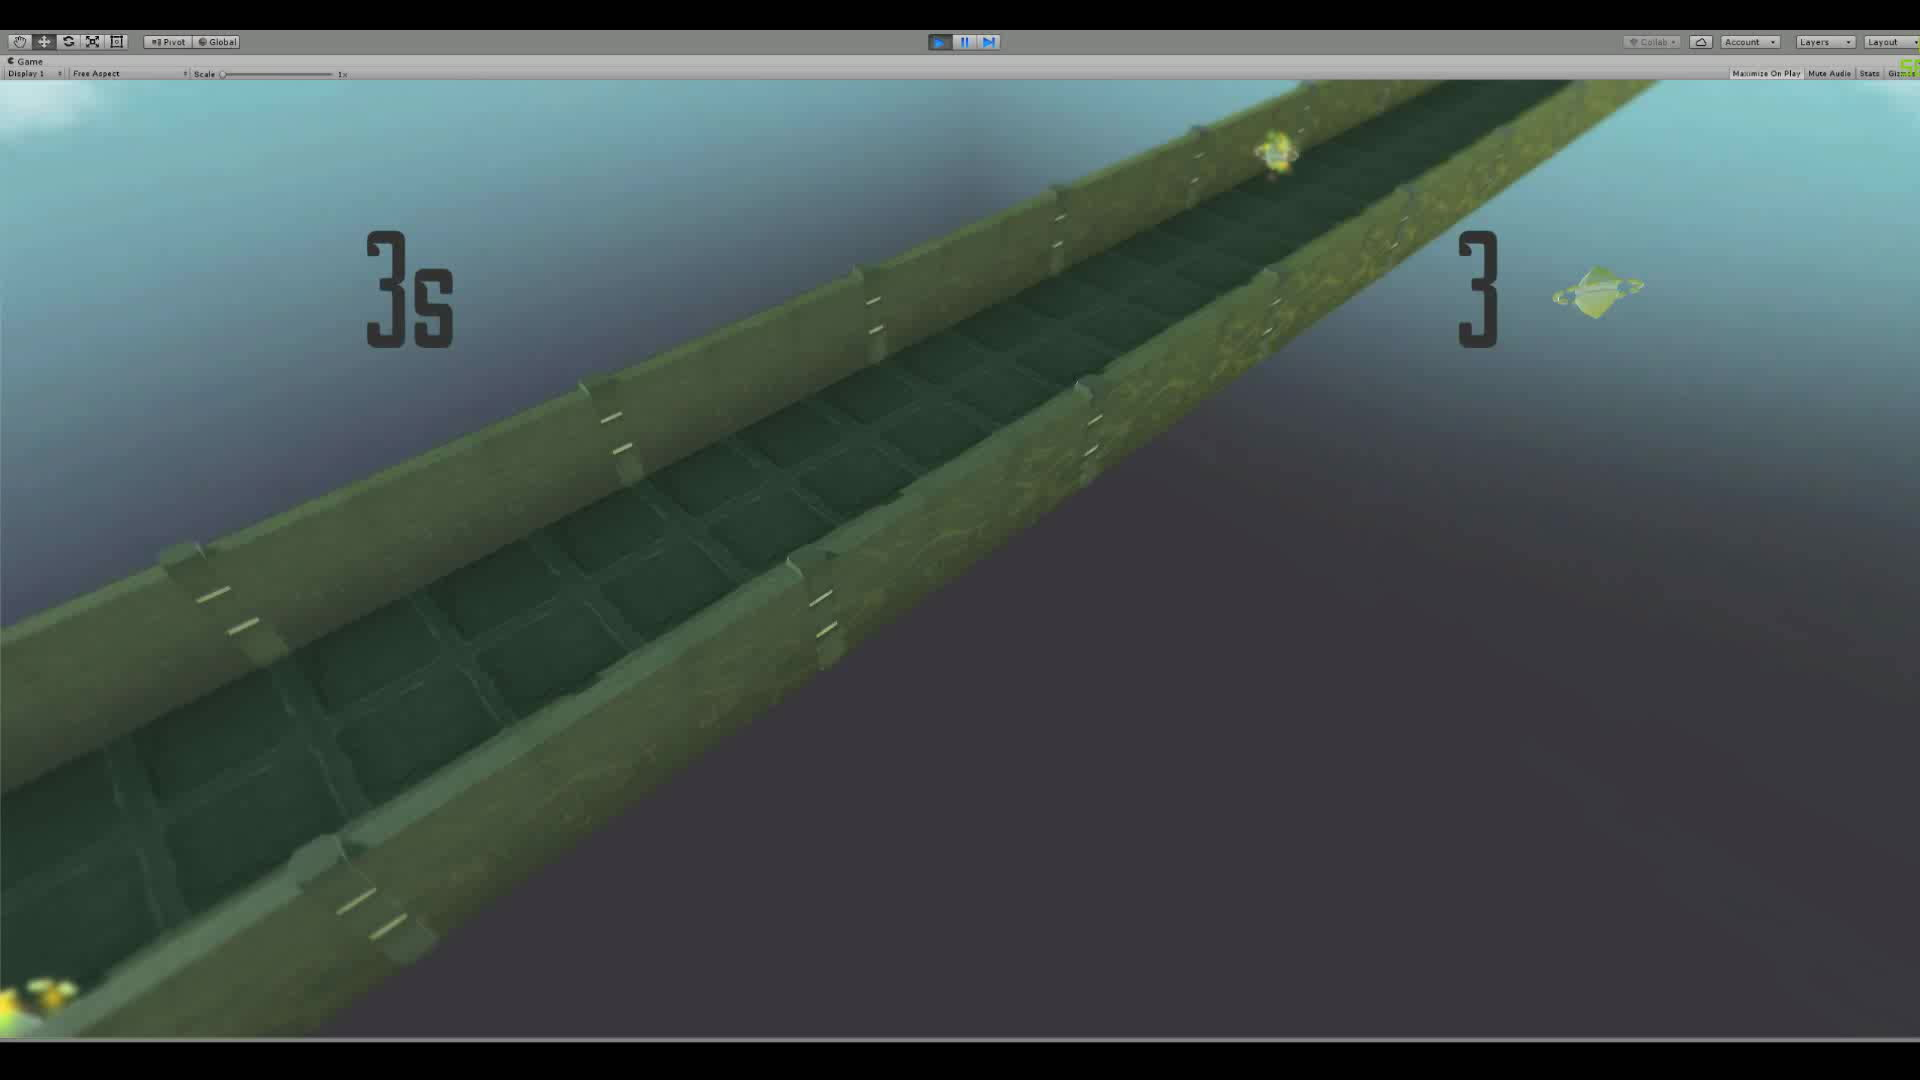 SkyLab, gamedev, indiedev, SkyLab - Nonlethal VFX GIFs